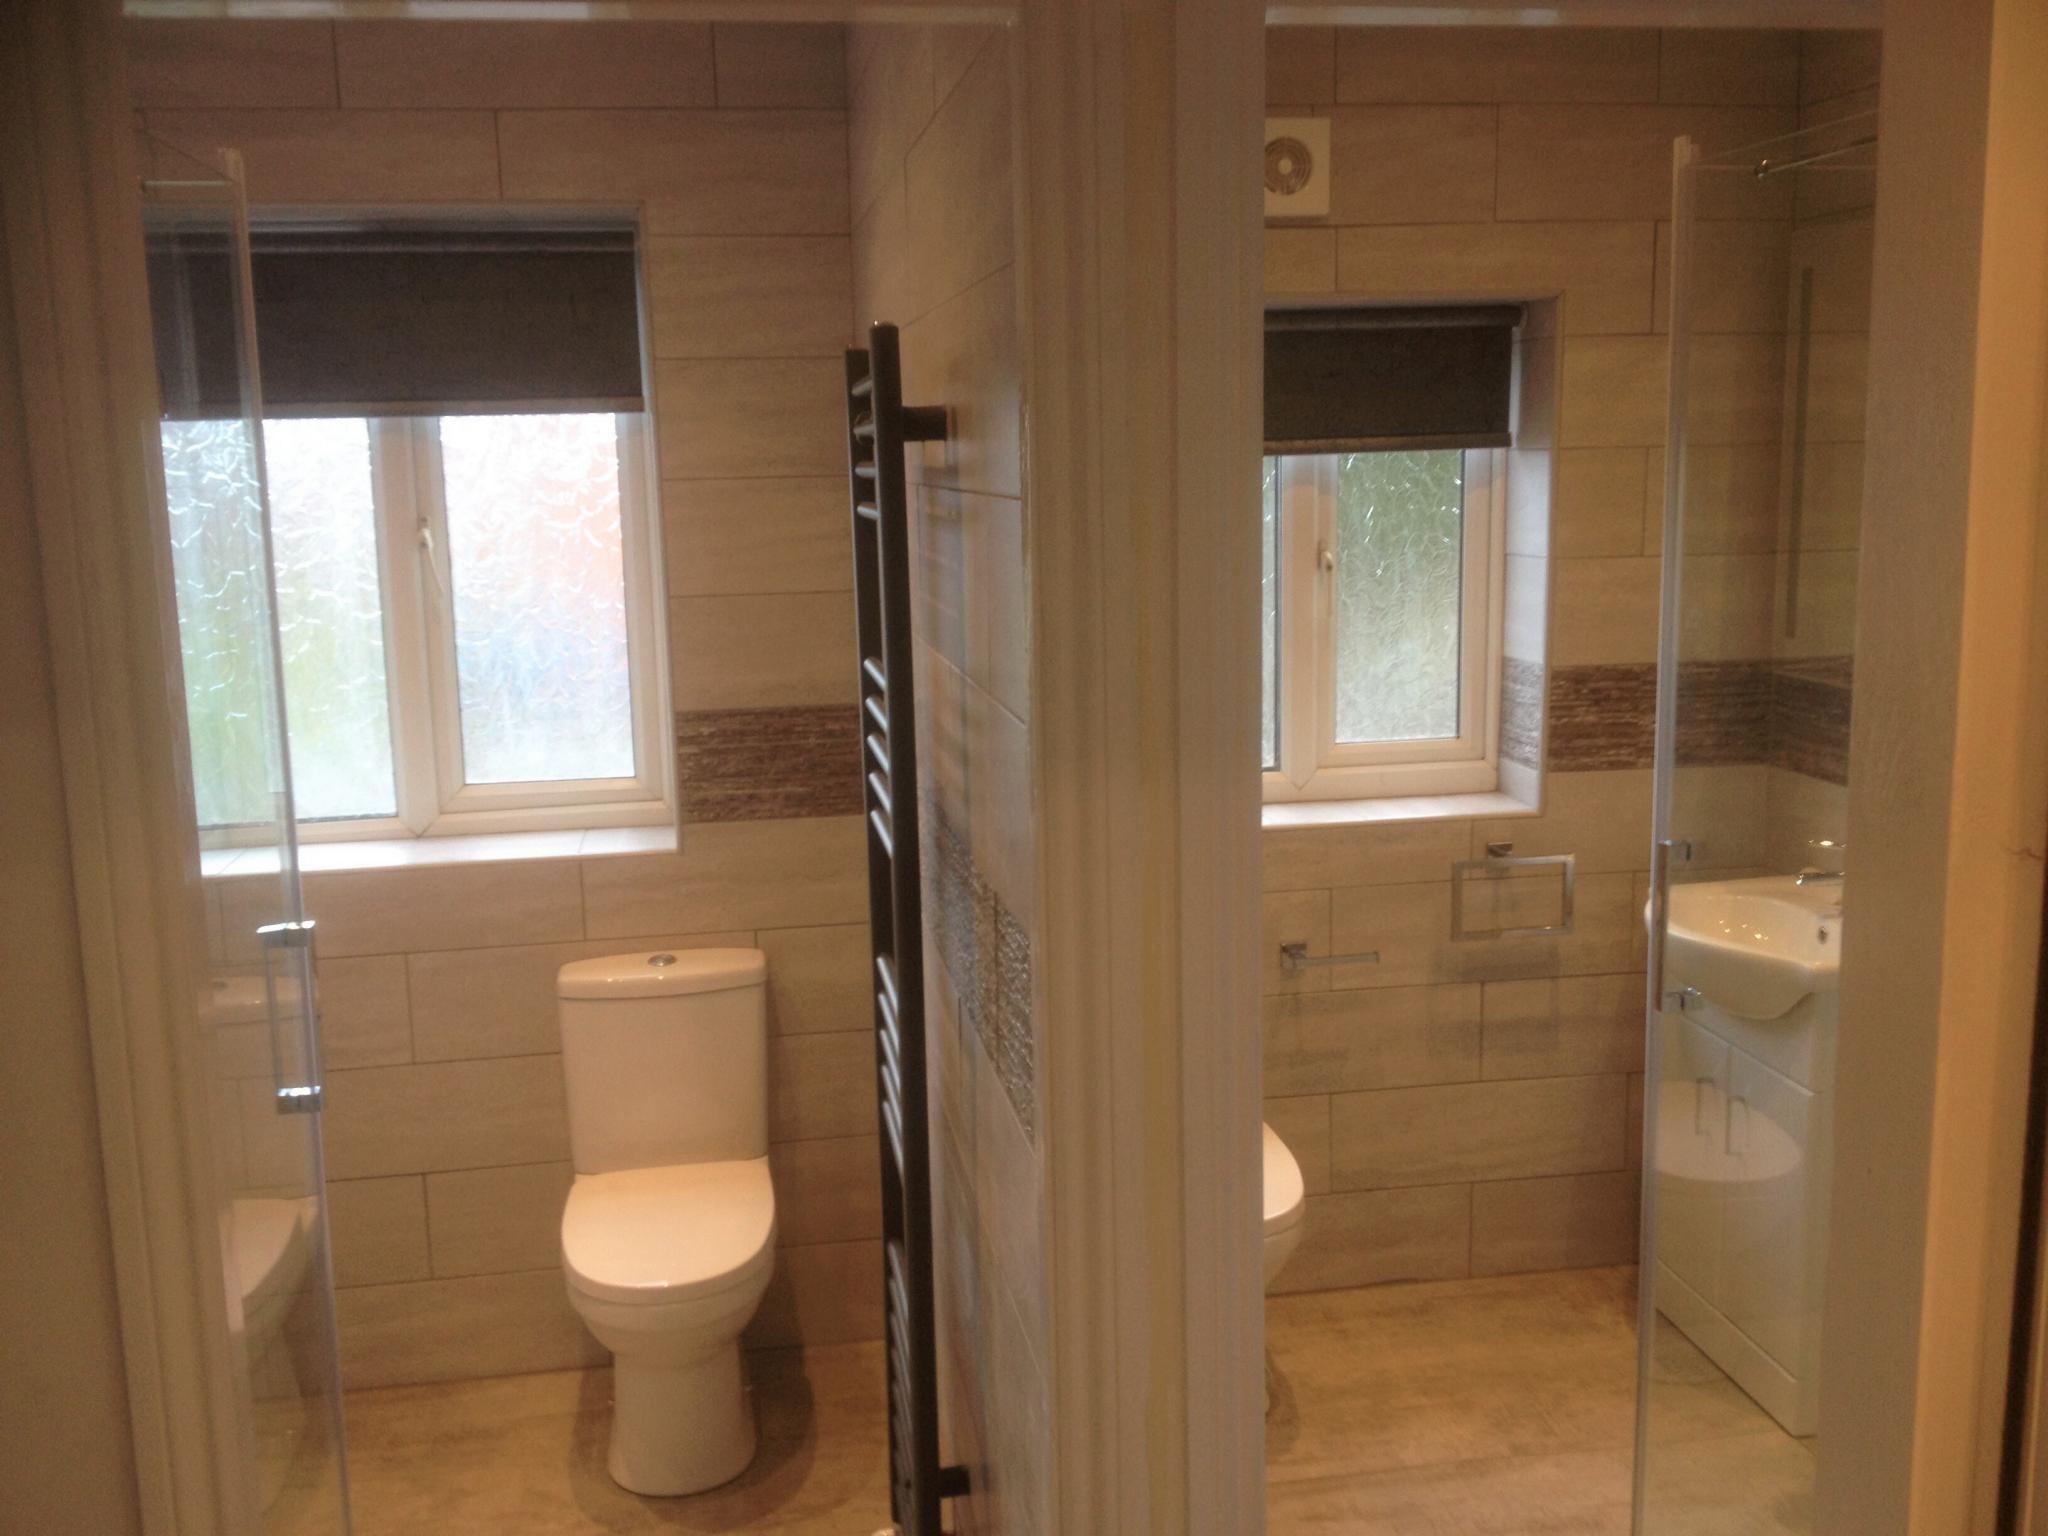 1 Bedroom Semi-detached House To Rent - Shower Room